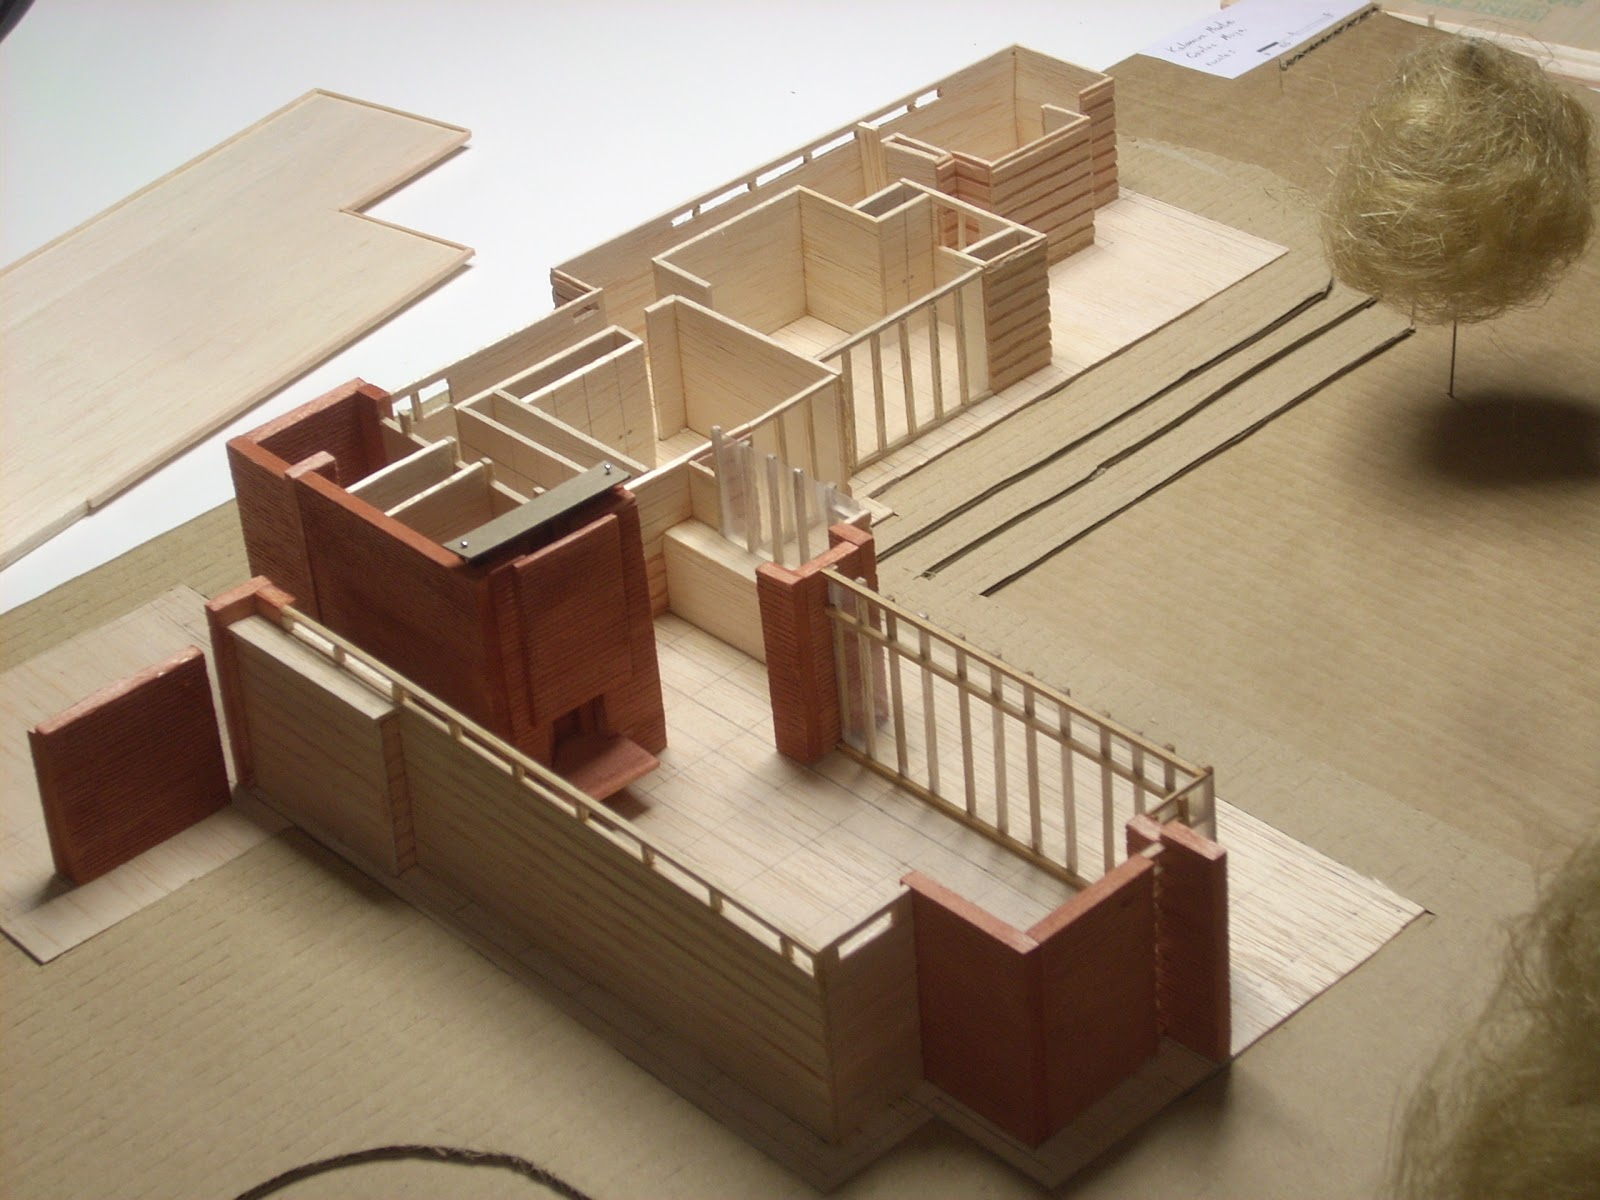 Frank Lloyd Wright Usonian House Plans Vitorio Marco Jacobs House Frank Lloyd Wright Vyborg